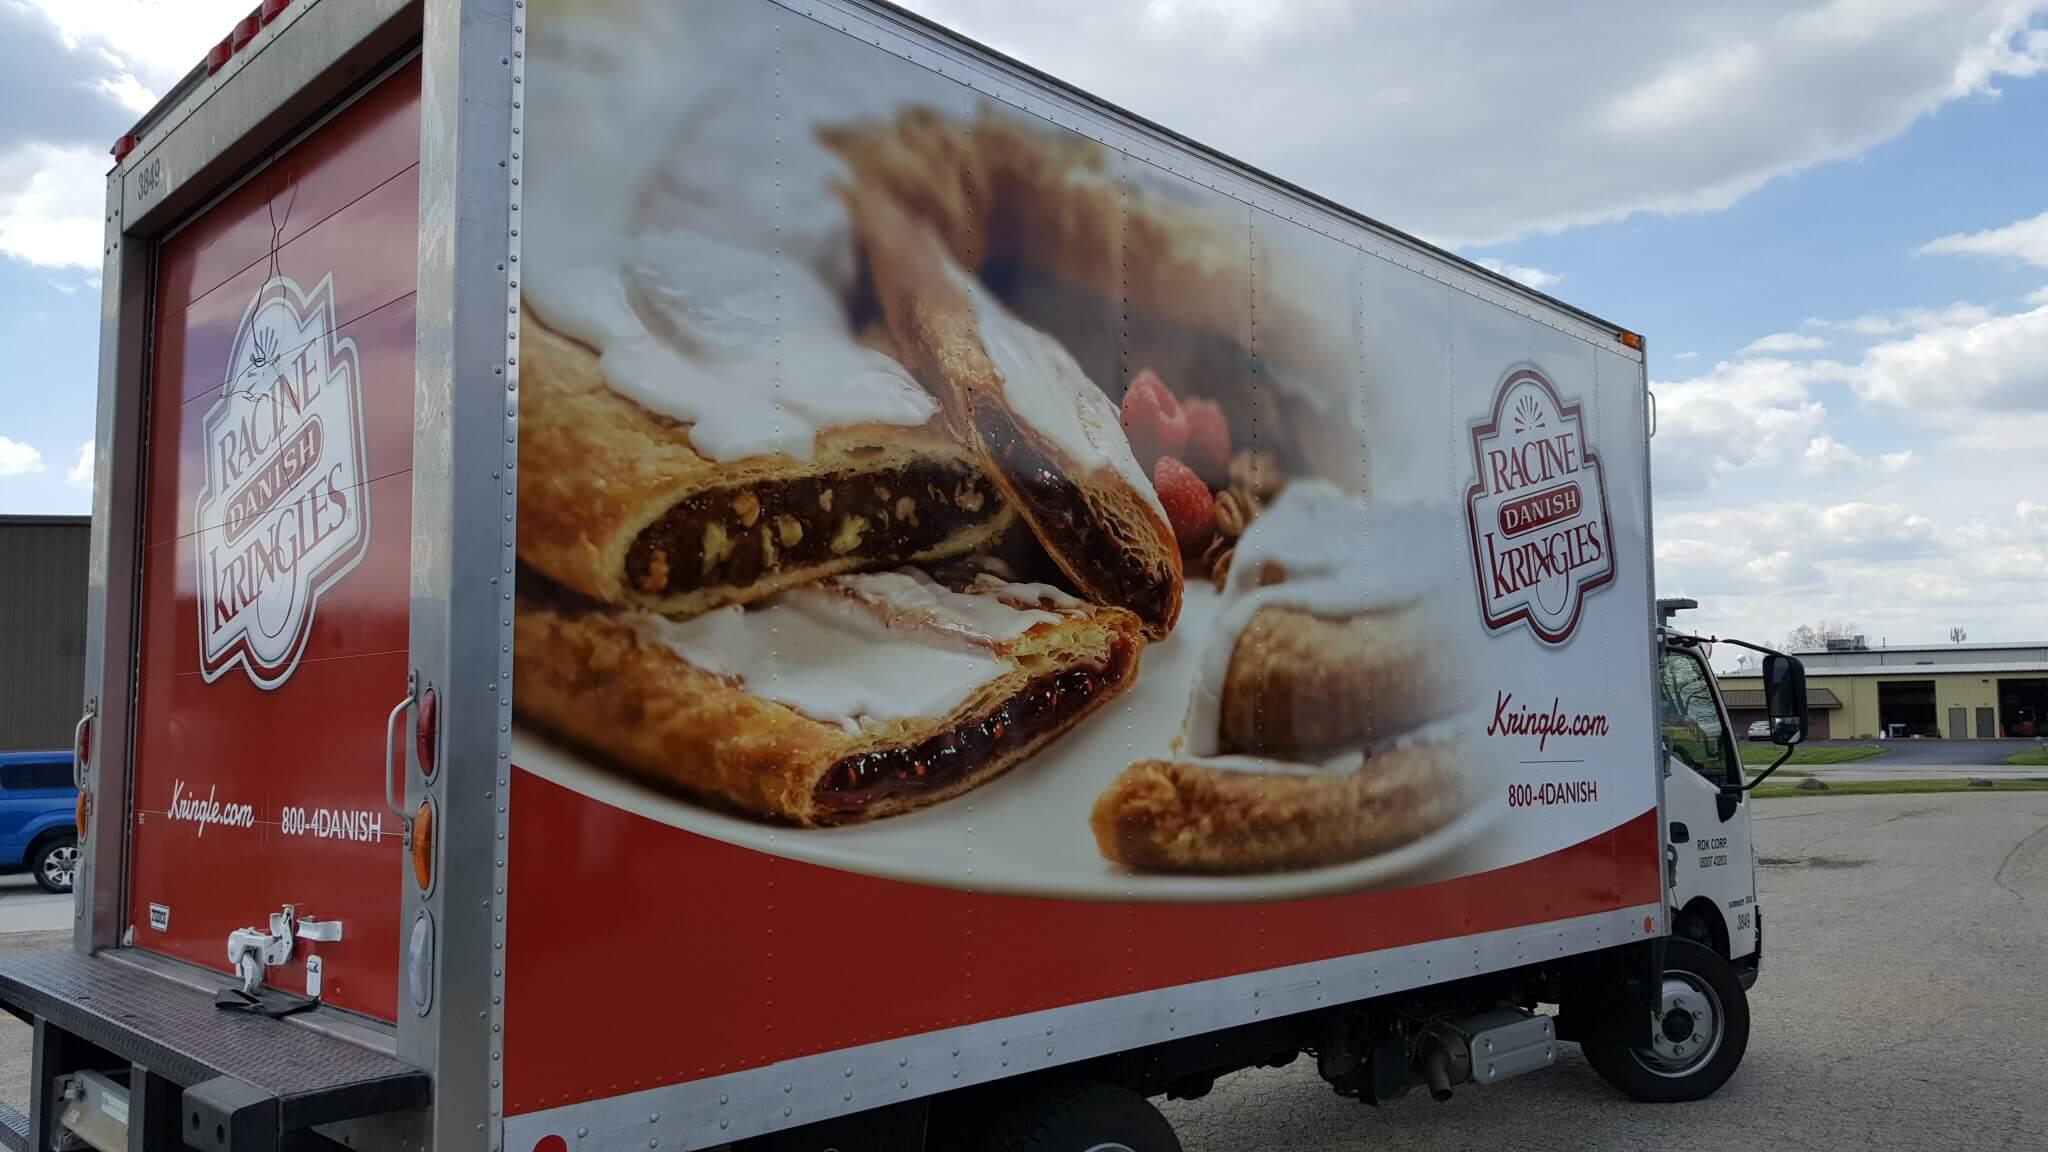 Racing Kringle delivery truck vinyl wrap